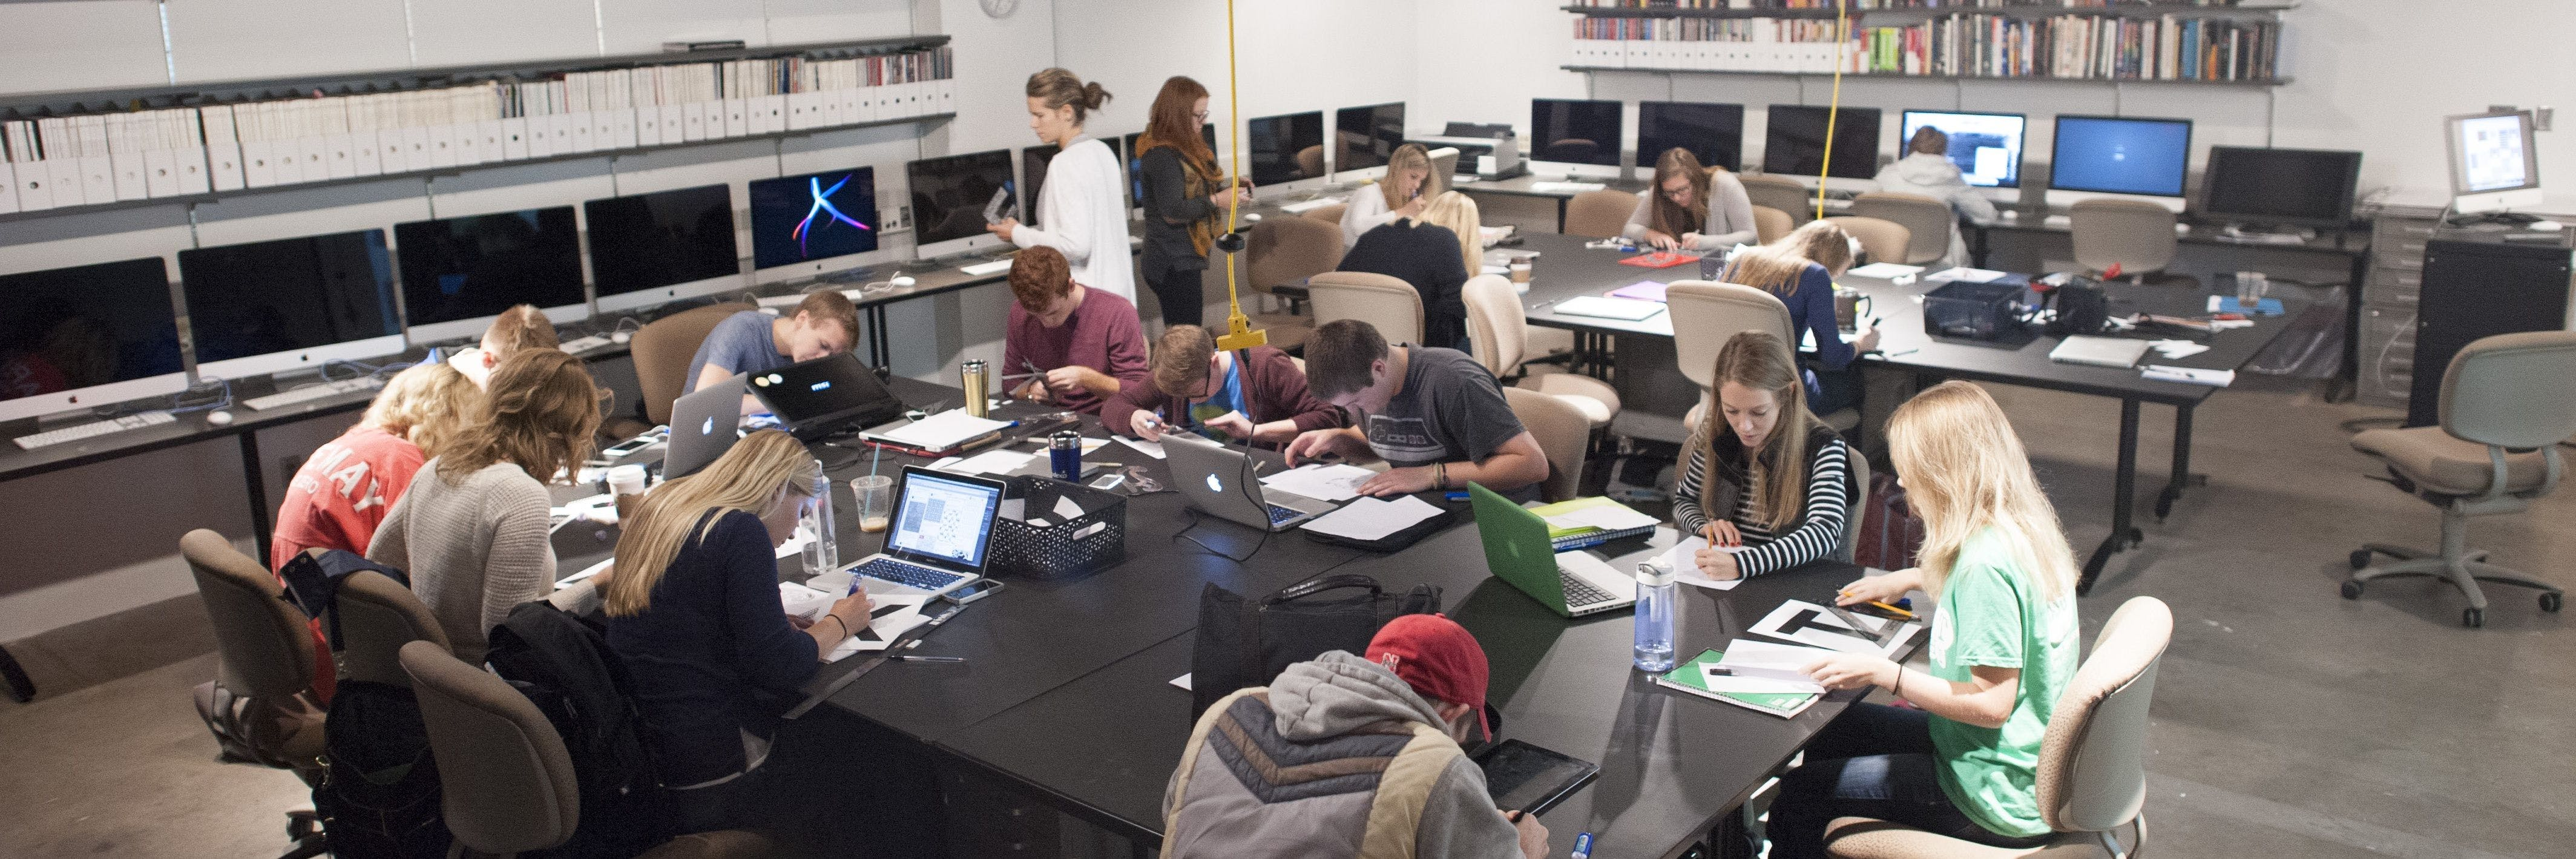 Students work in a design studio.